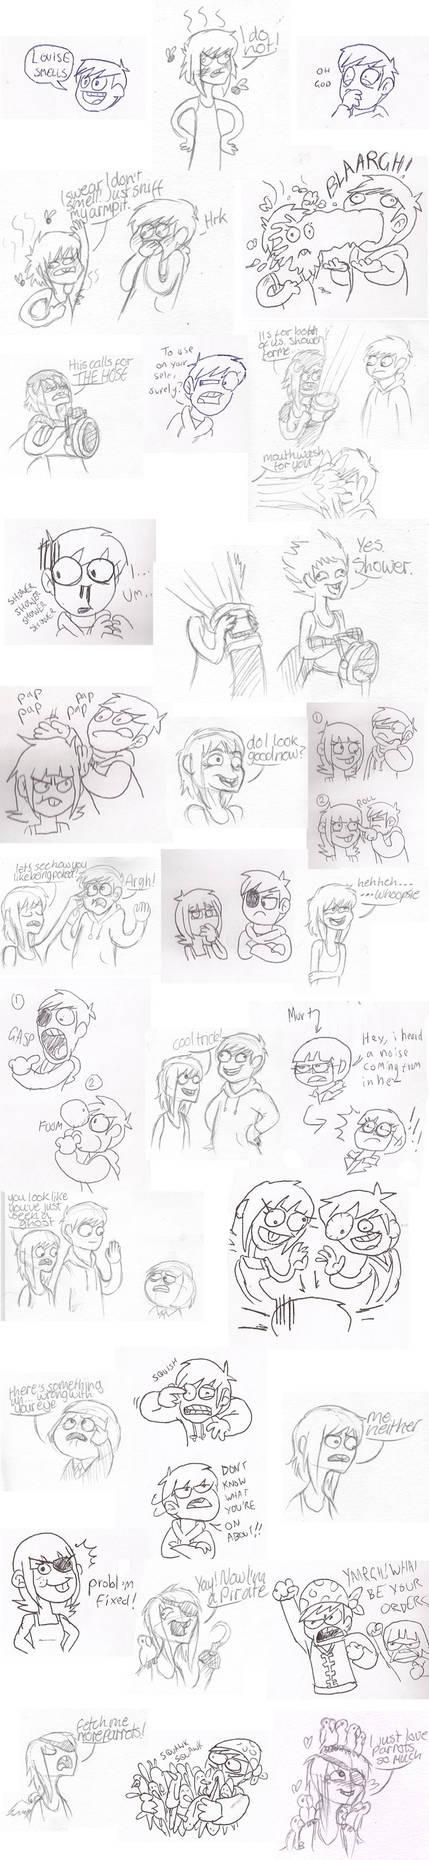 Doodle Fight via MMS